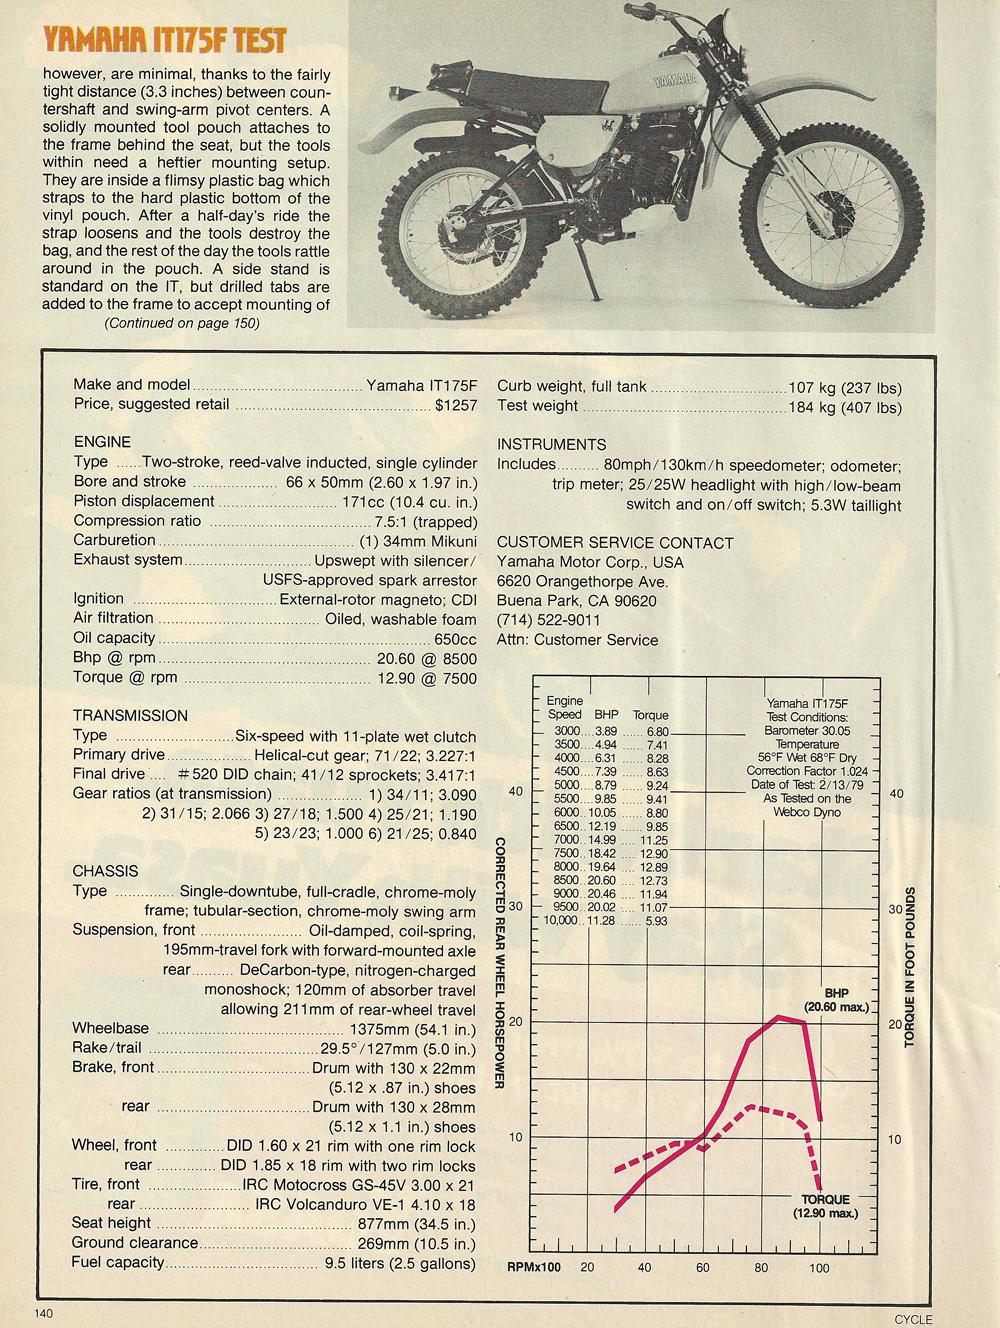 1979 Yamaha IT175F off road test 7.jpg